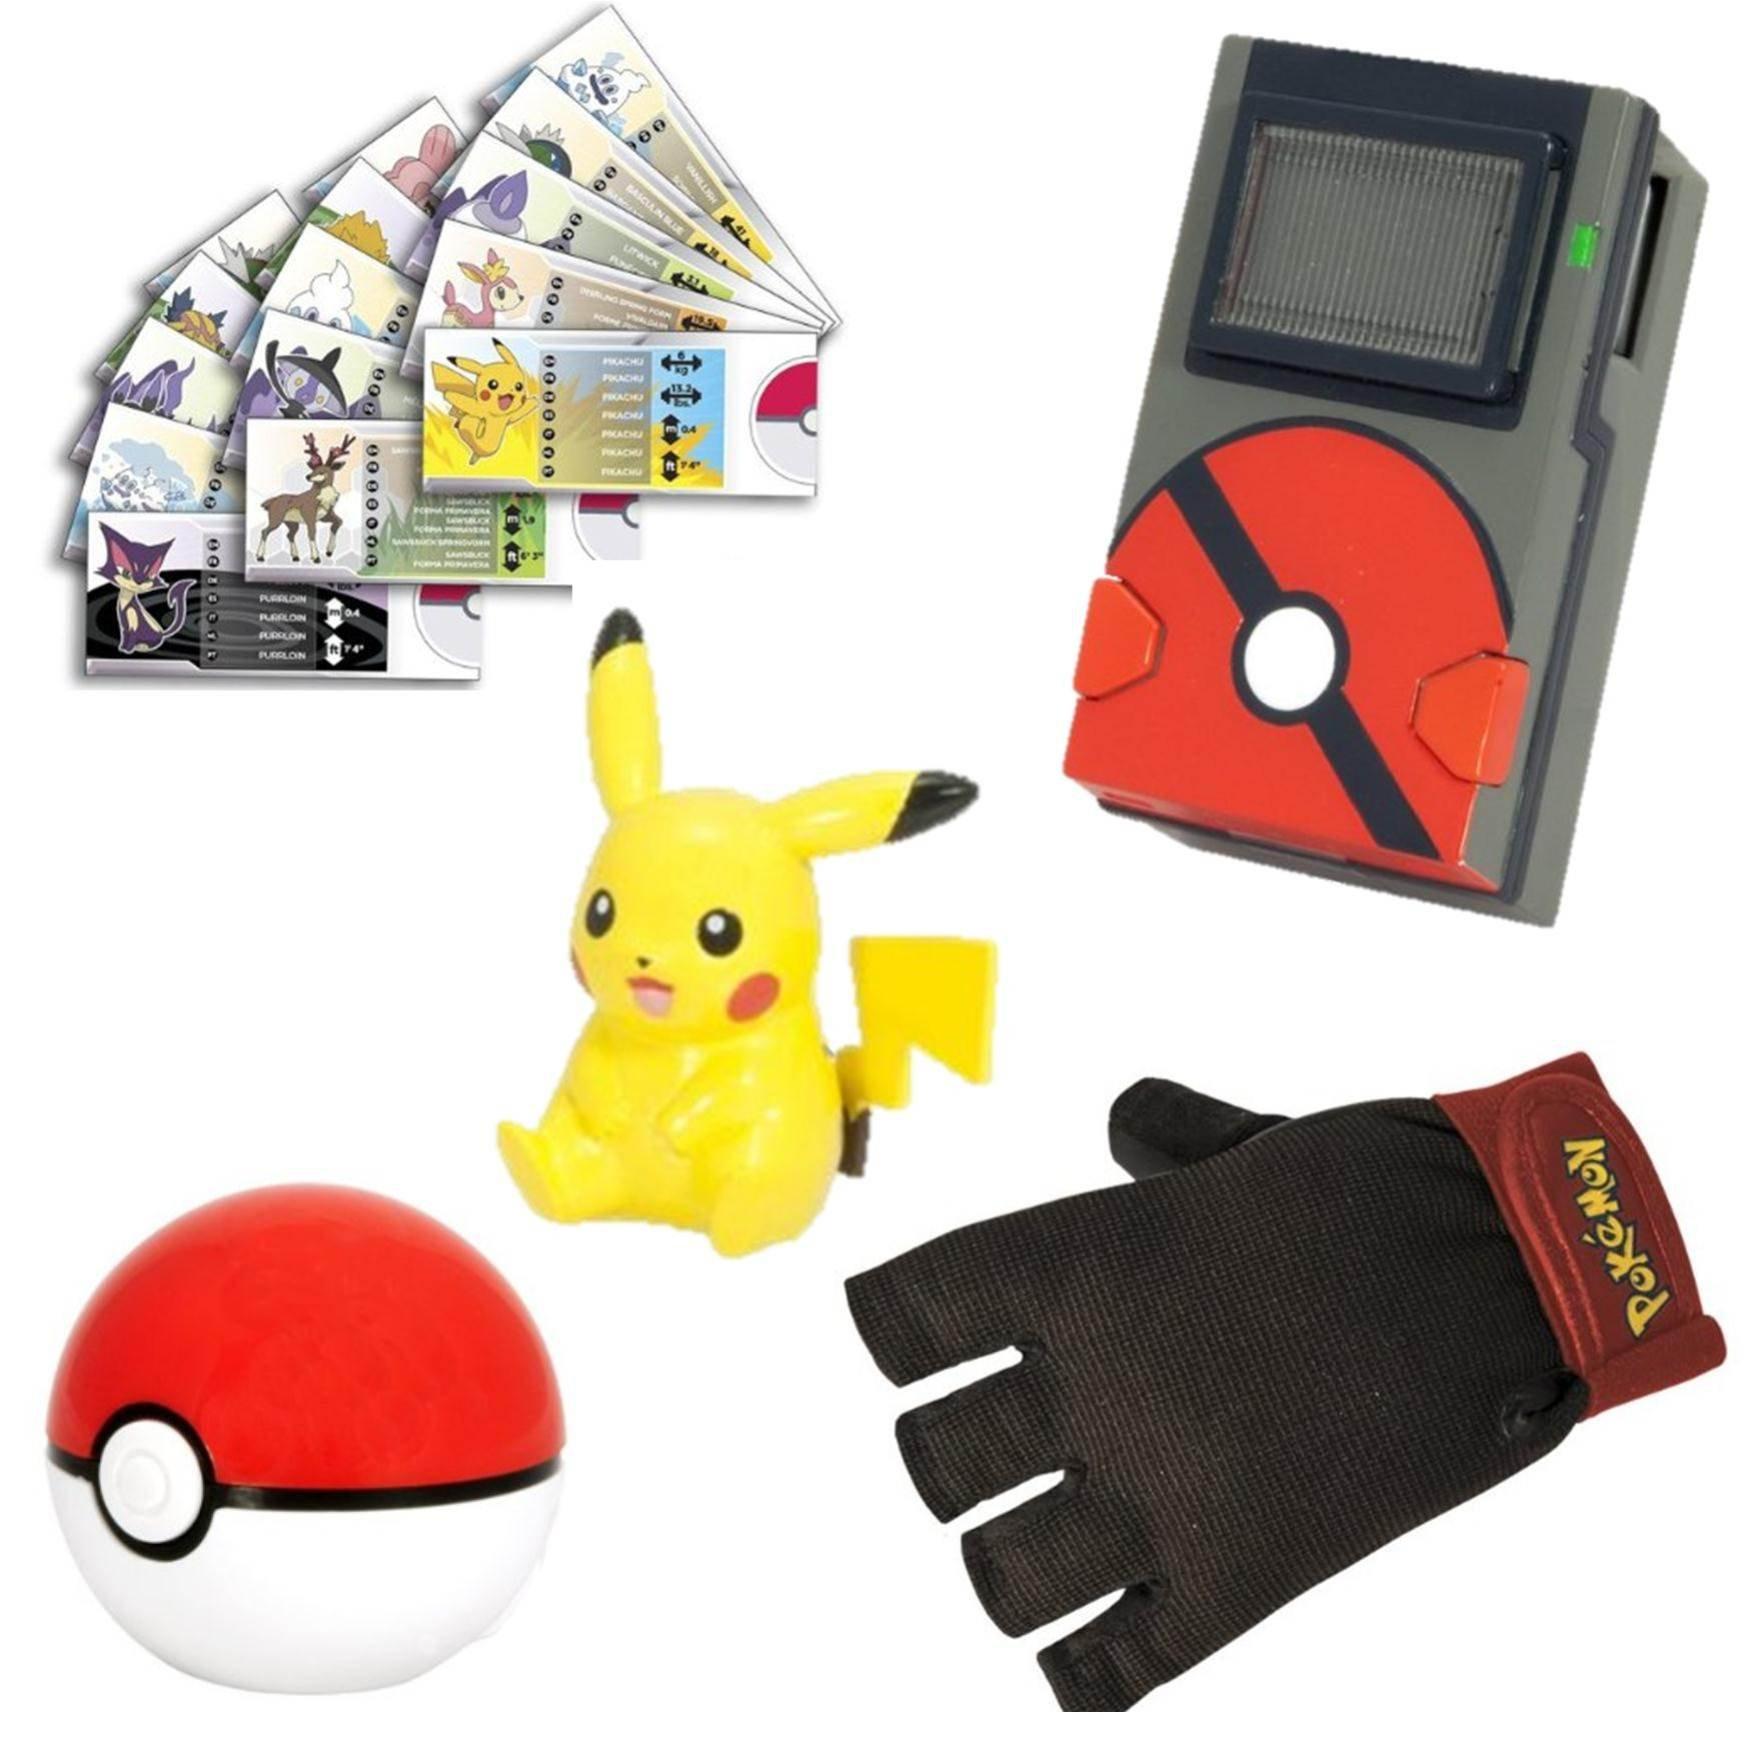 Toys For Trainers : Pokemon pokedex trainer kit ebay